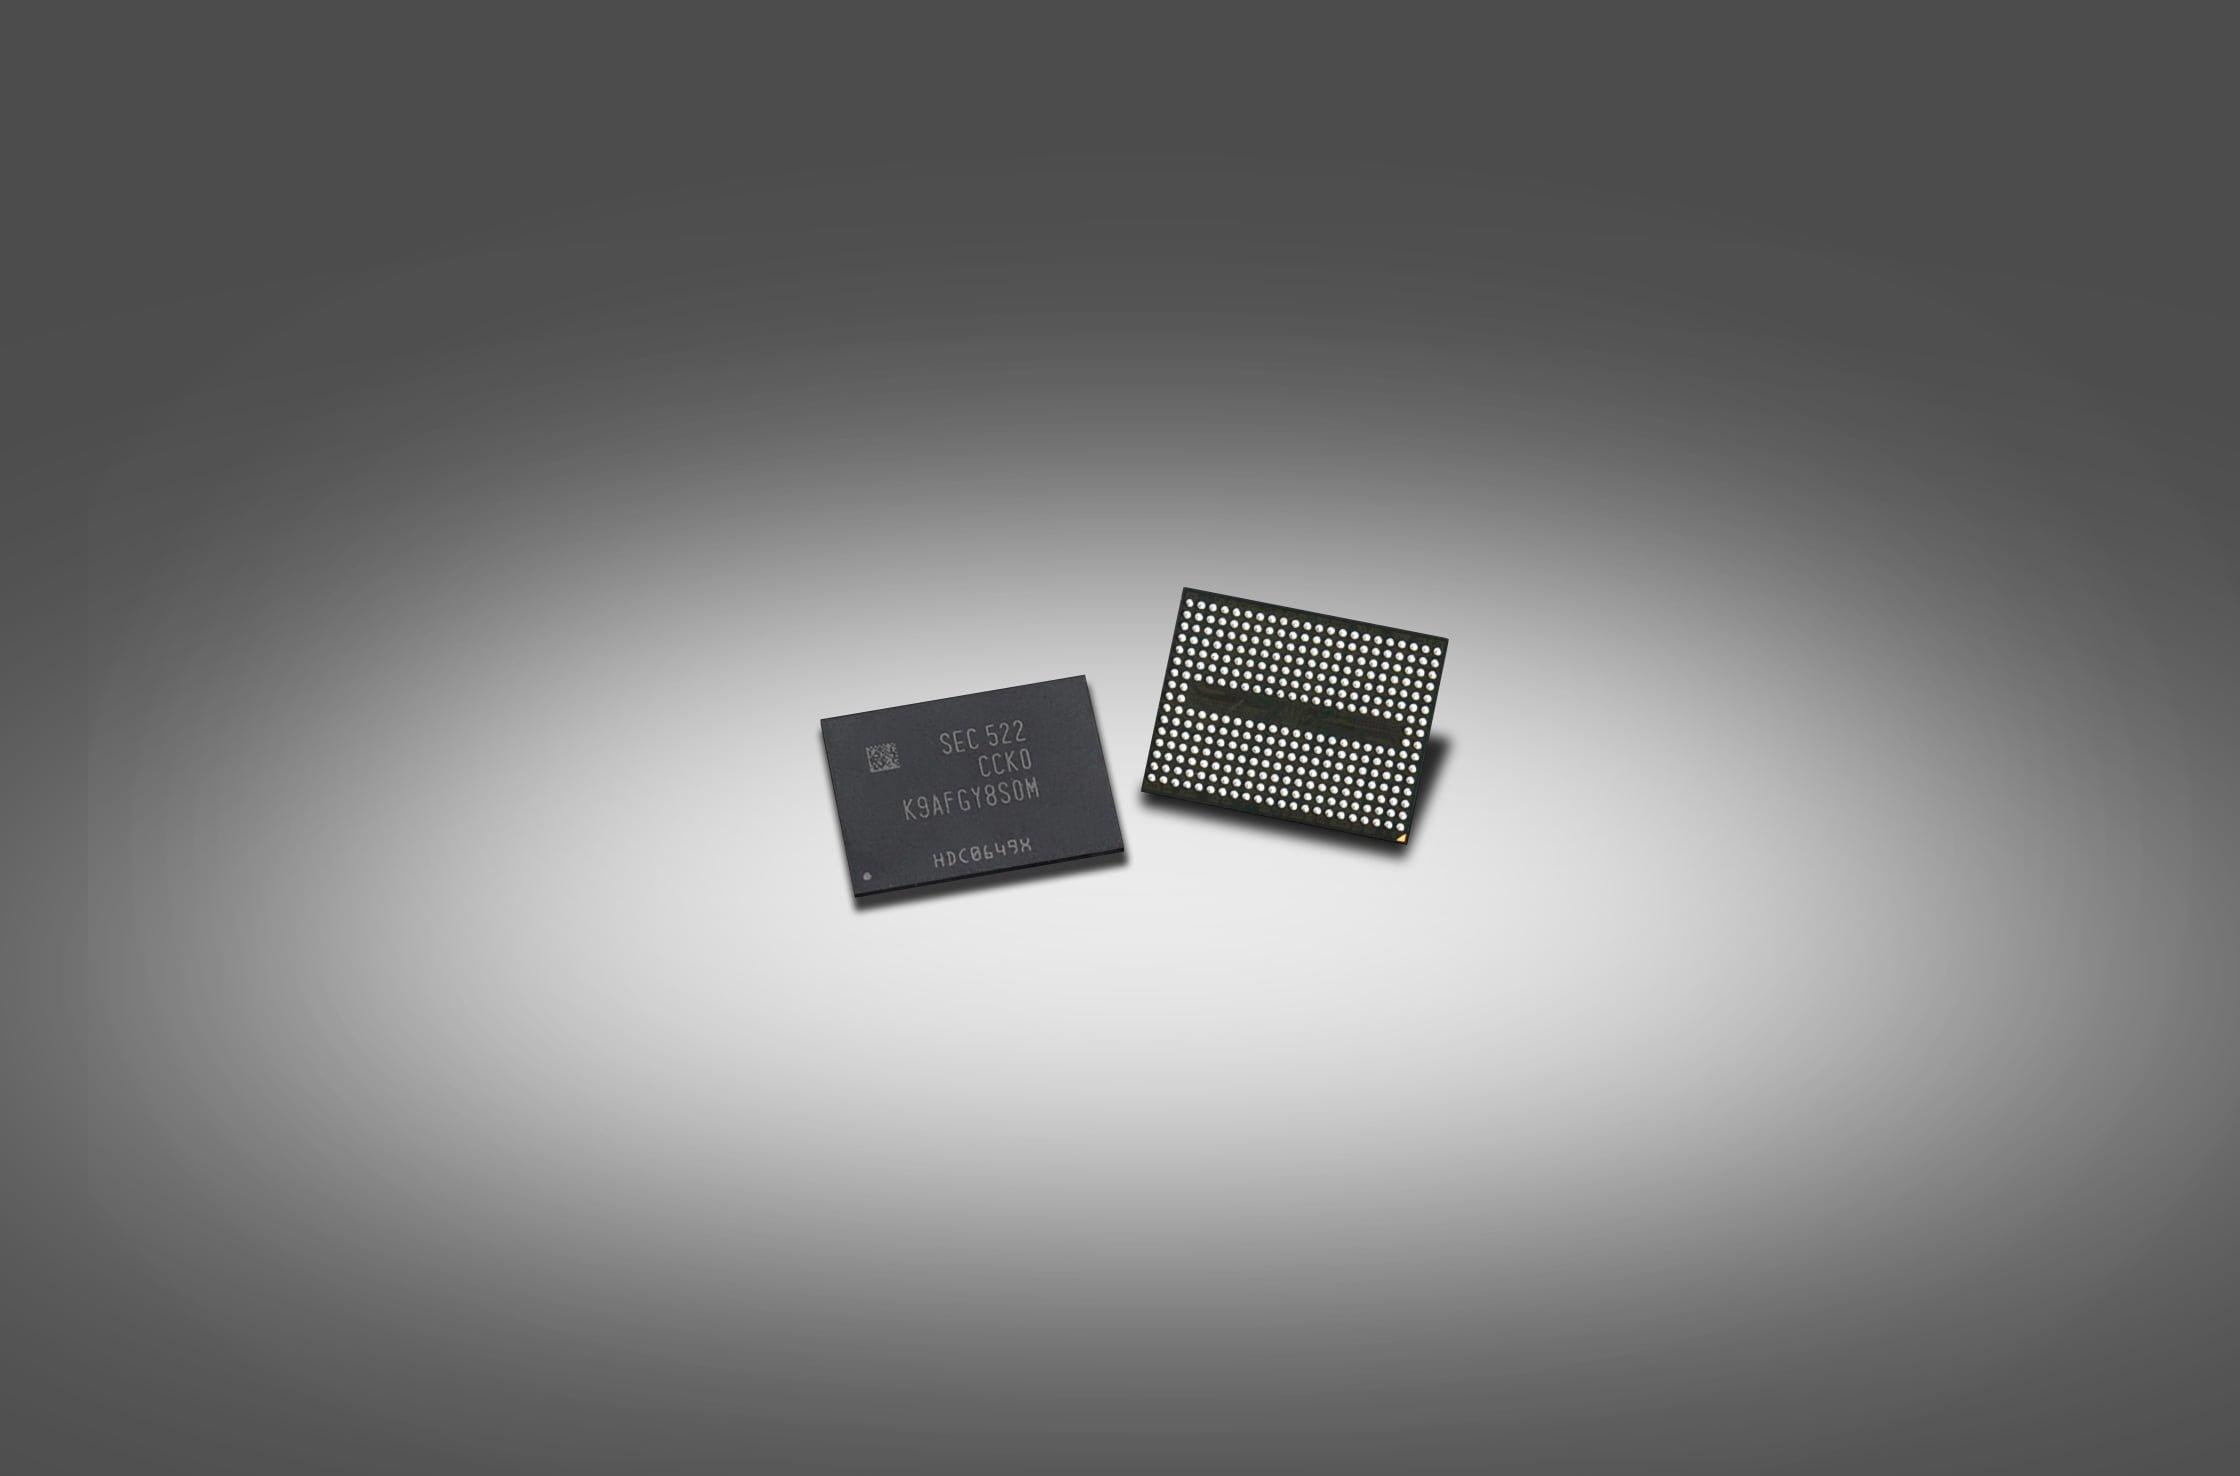 Samsung Electronics Begins Mass Producing Industry First 256 Gigabit